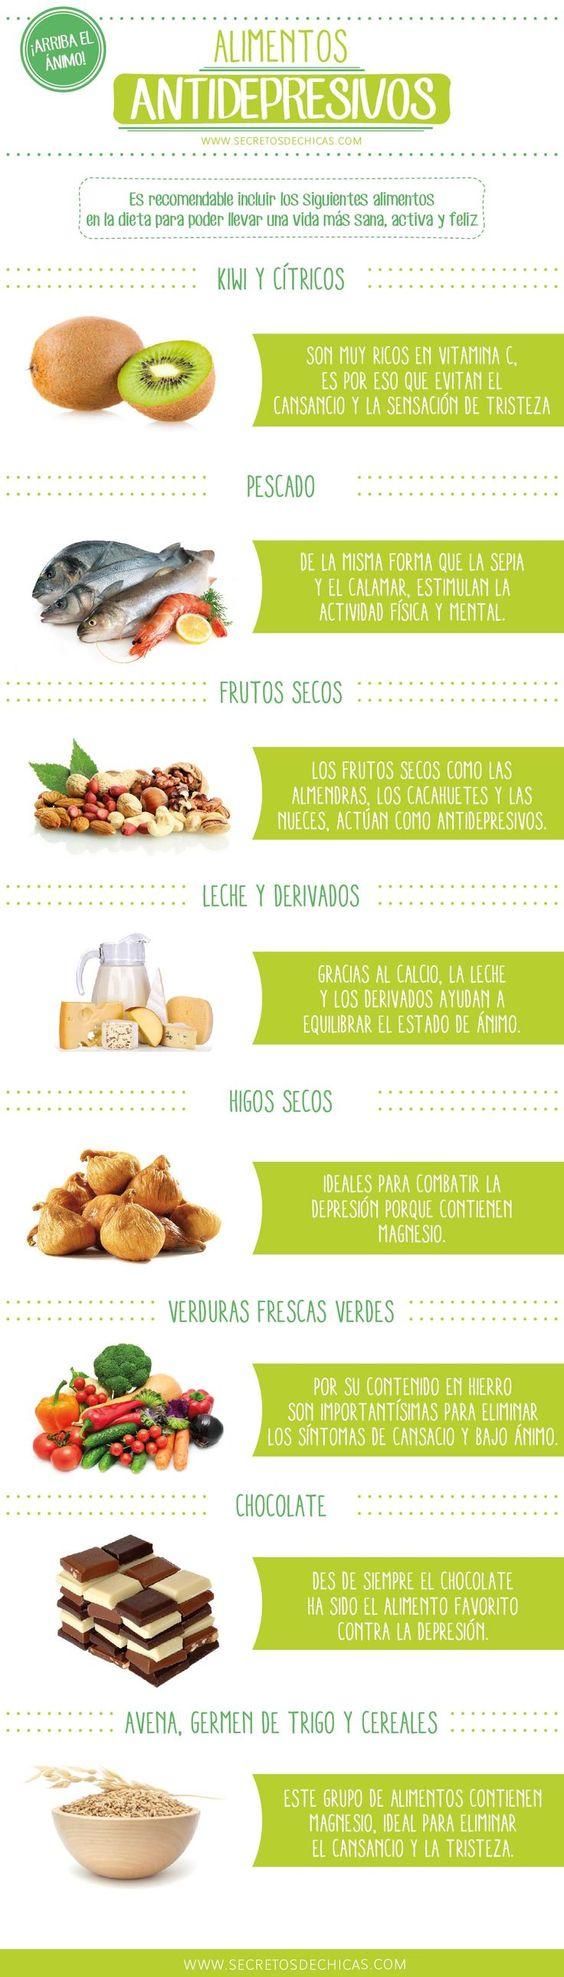 Alimentos antidepresivos - Alimentos contra depresion ...